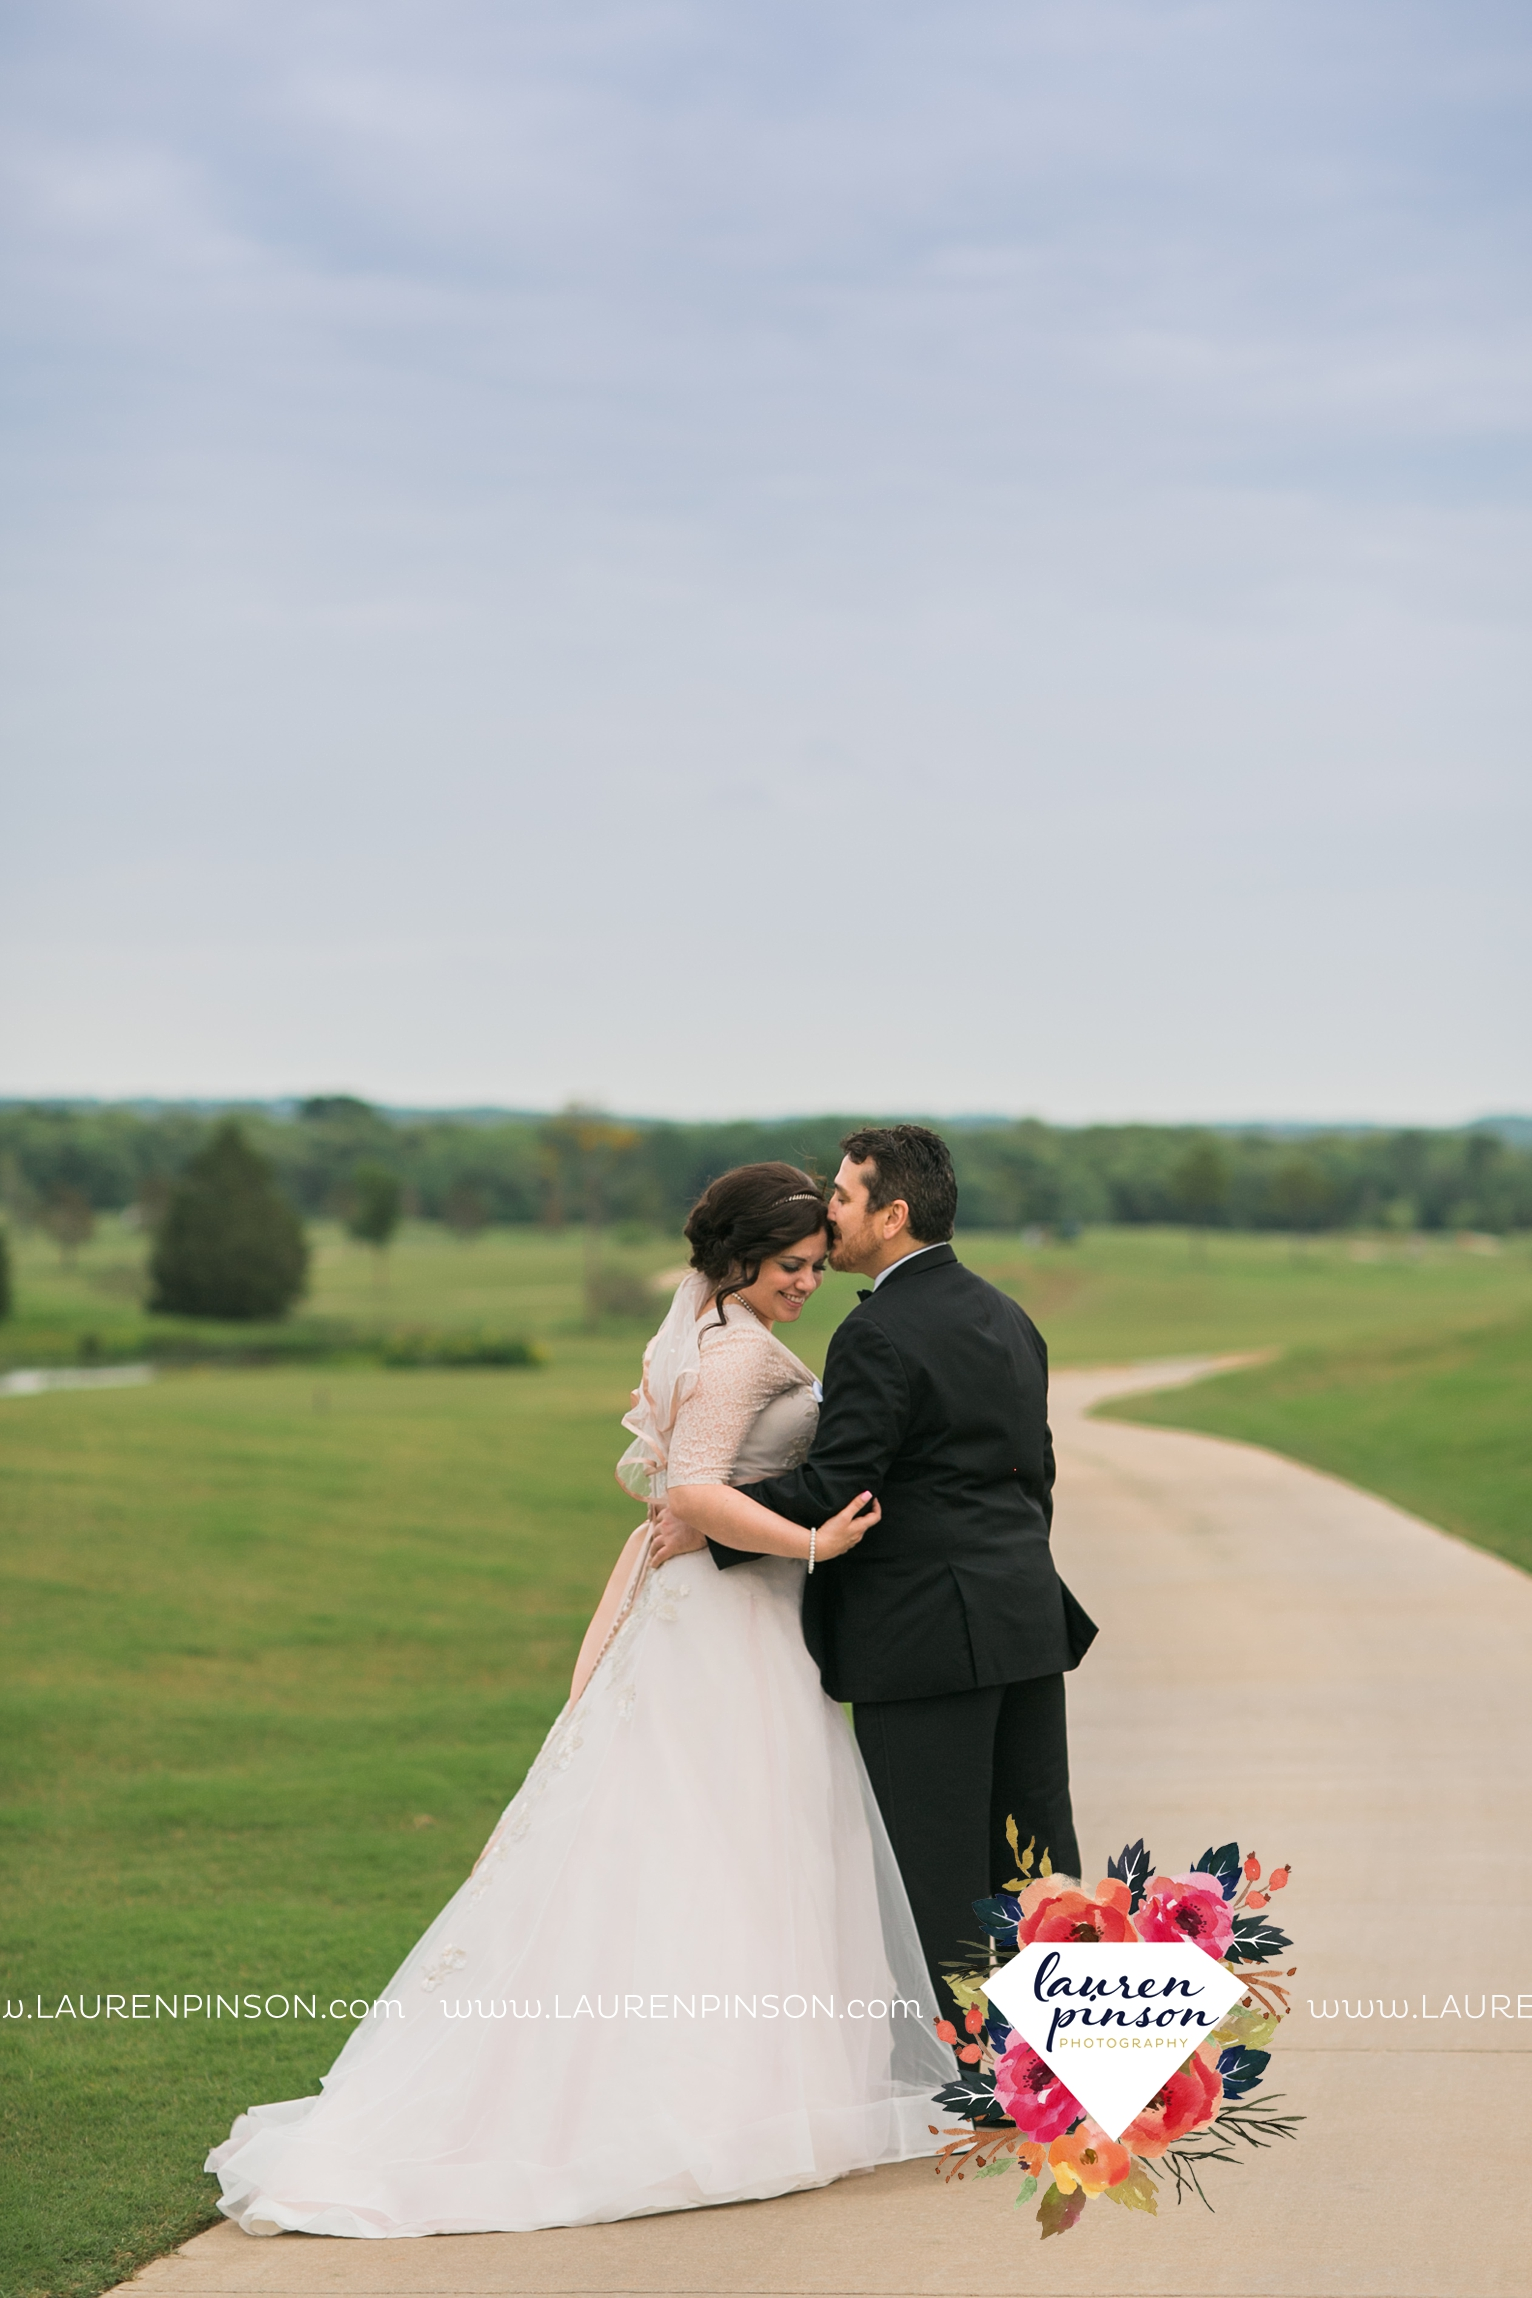 gainesville-texas-sherman-texas-thackerville-oklahoma-wedding-photographer-at-winstar-casino-golf-resort_2280.jpg